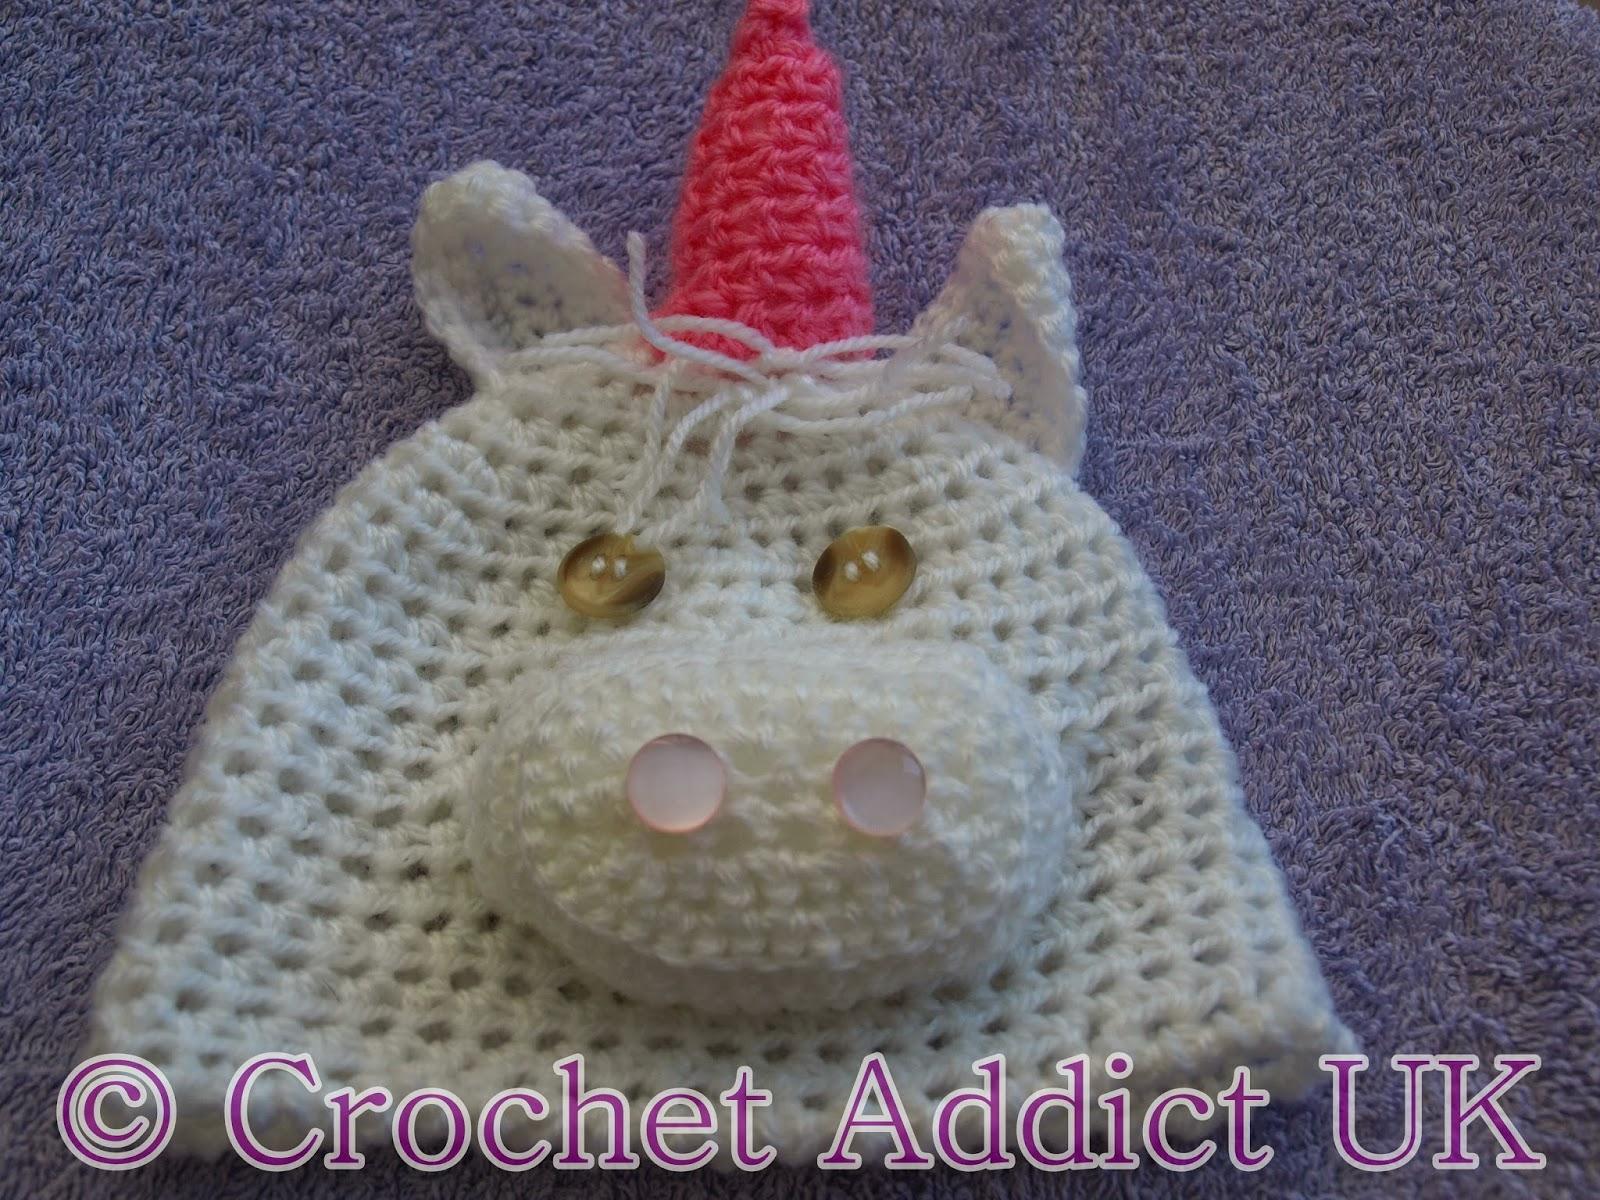 Crochet Unicorn Hat Pattern Free : ... Hat #Newborn - 12 months ~ #Free #Crochet Pattern ~ Crochet Addict UK